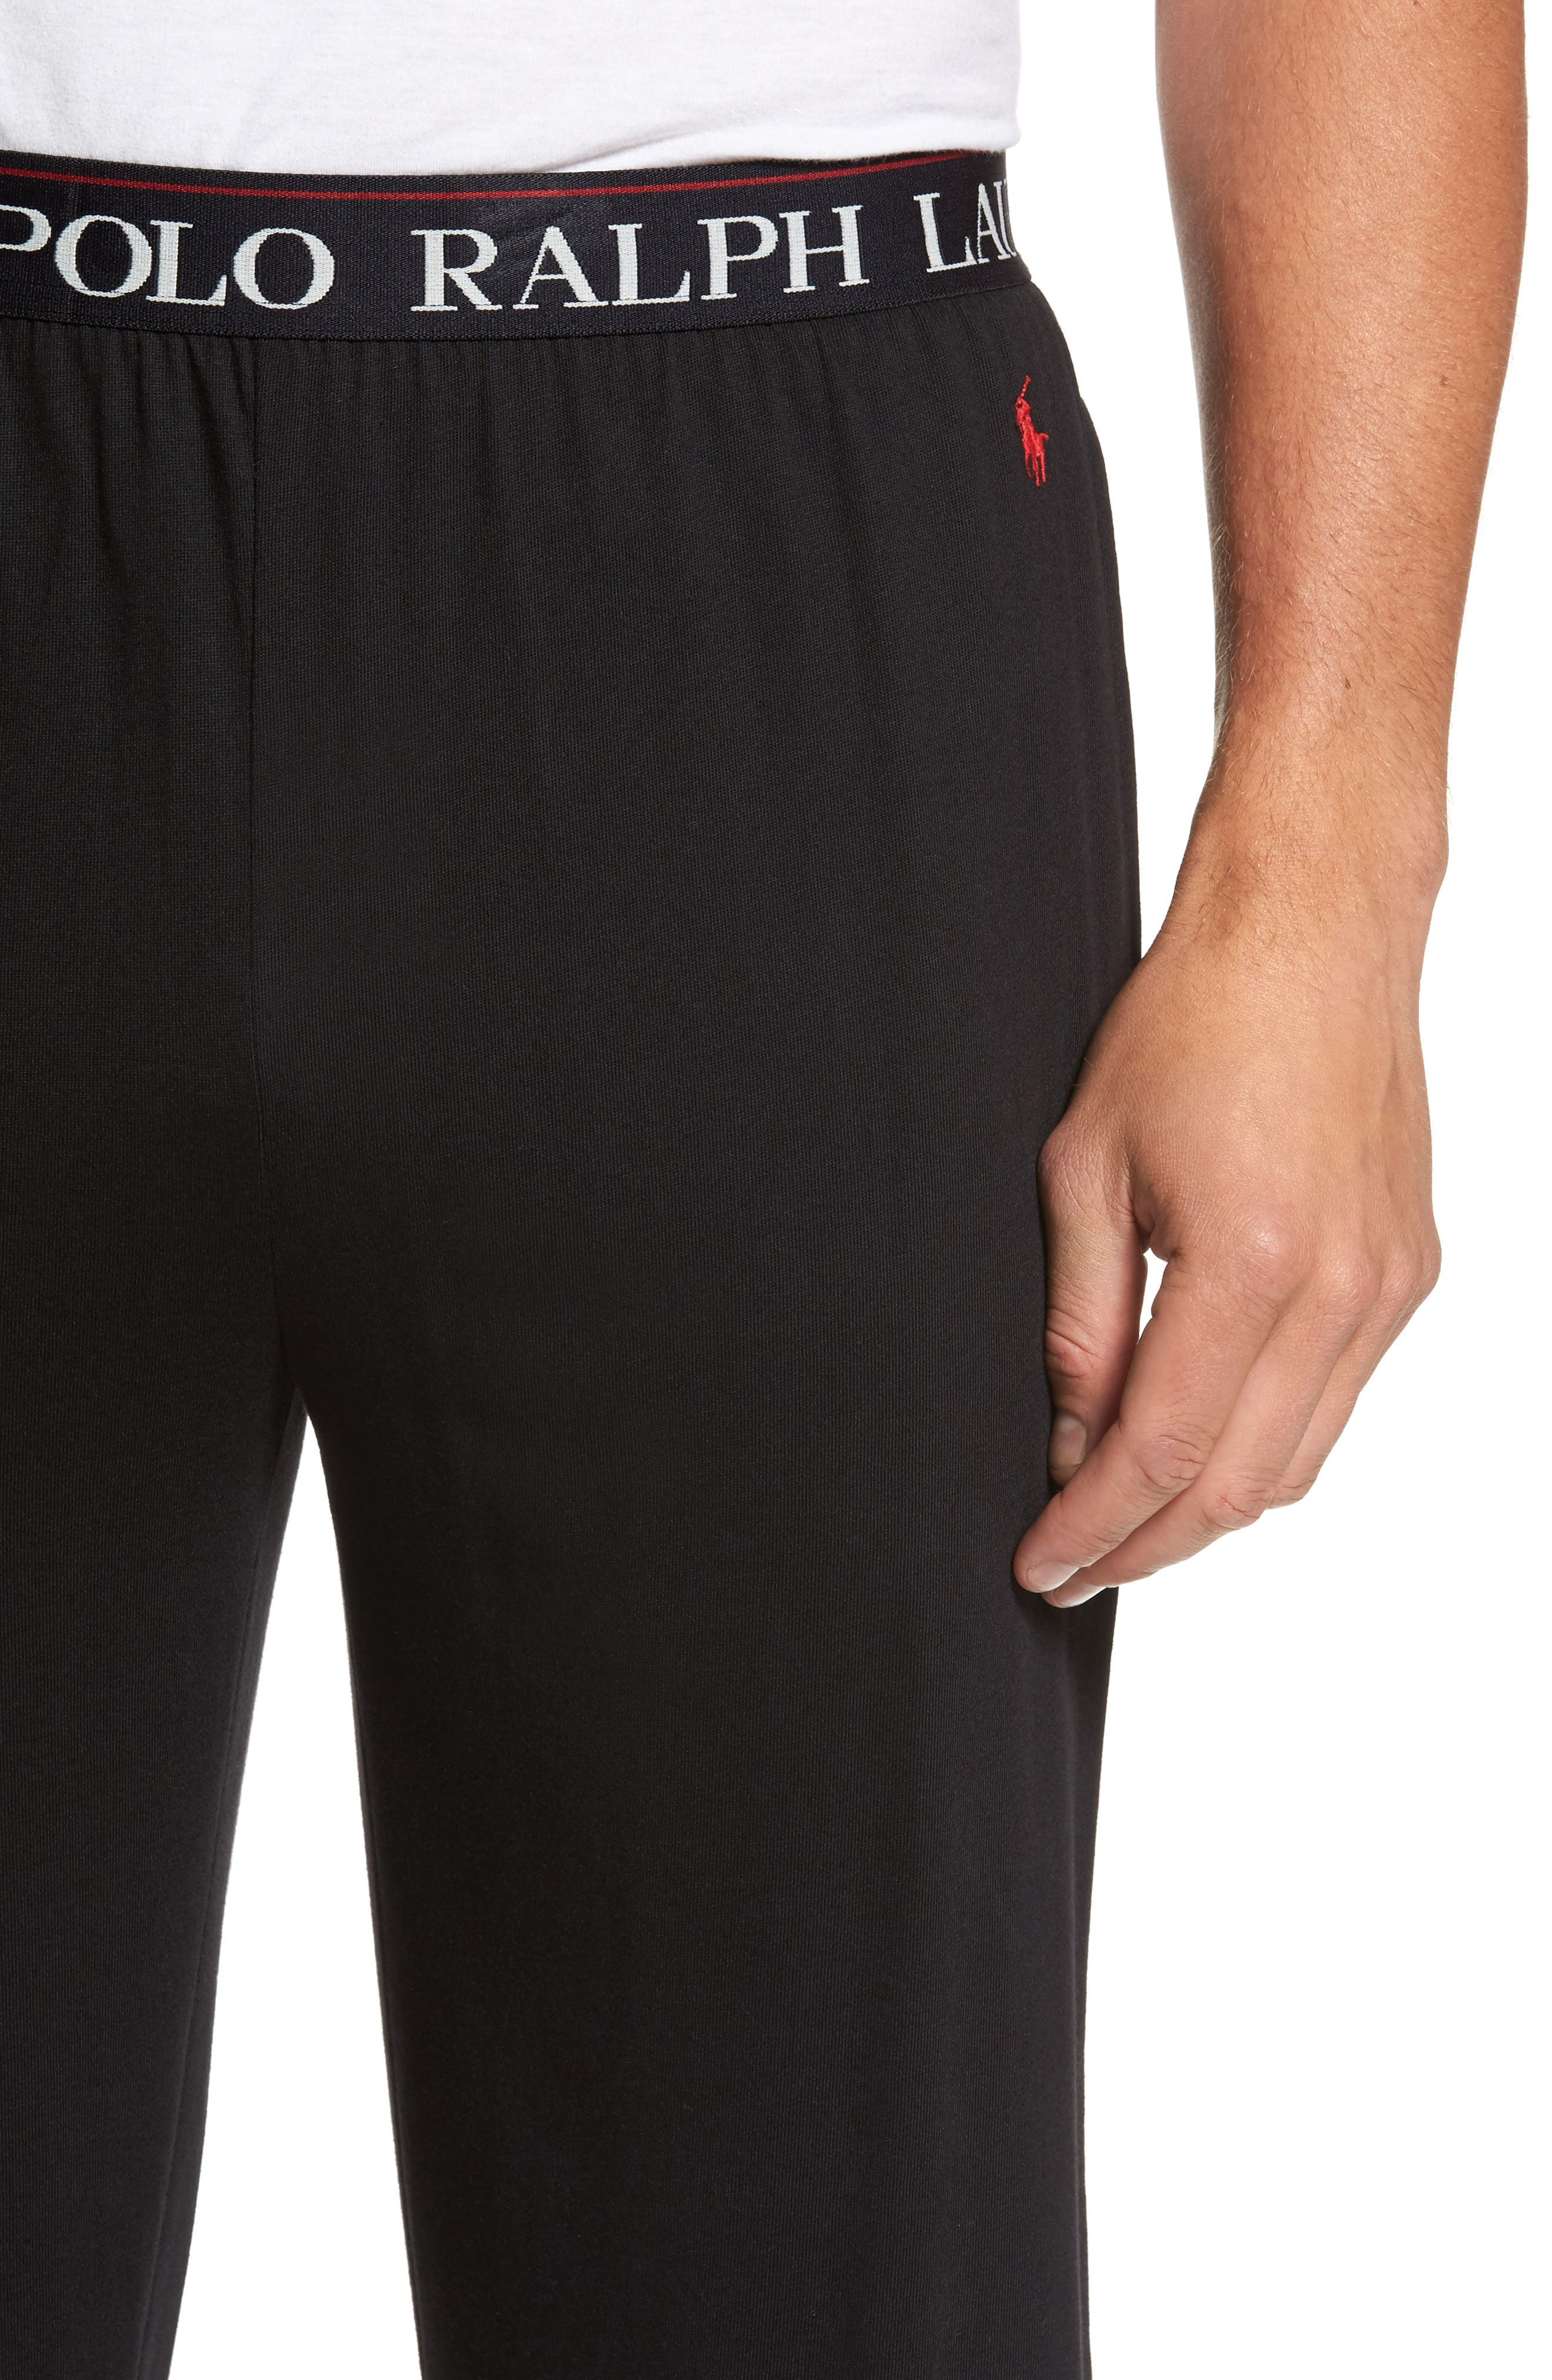 Cotton & Modal Lounge Pants,                             Alternate thumbnail 4, color,                             POLO BLACK